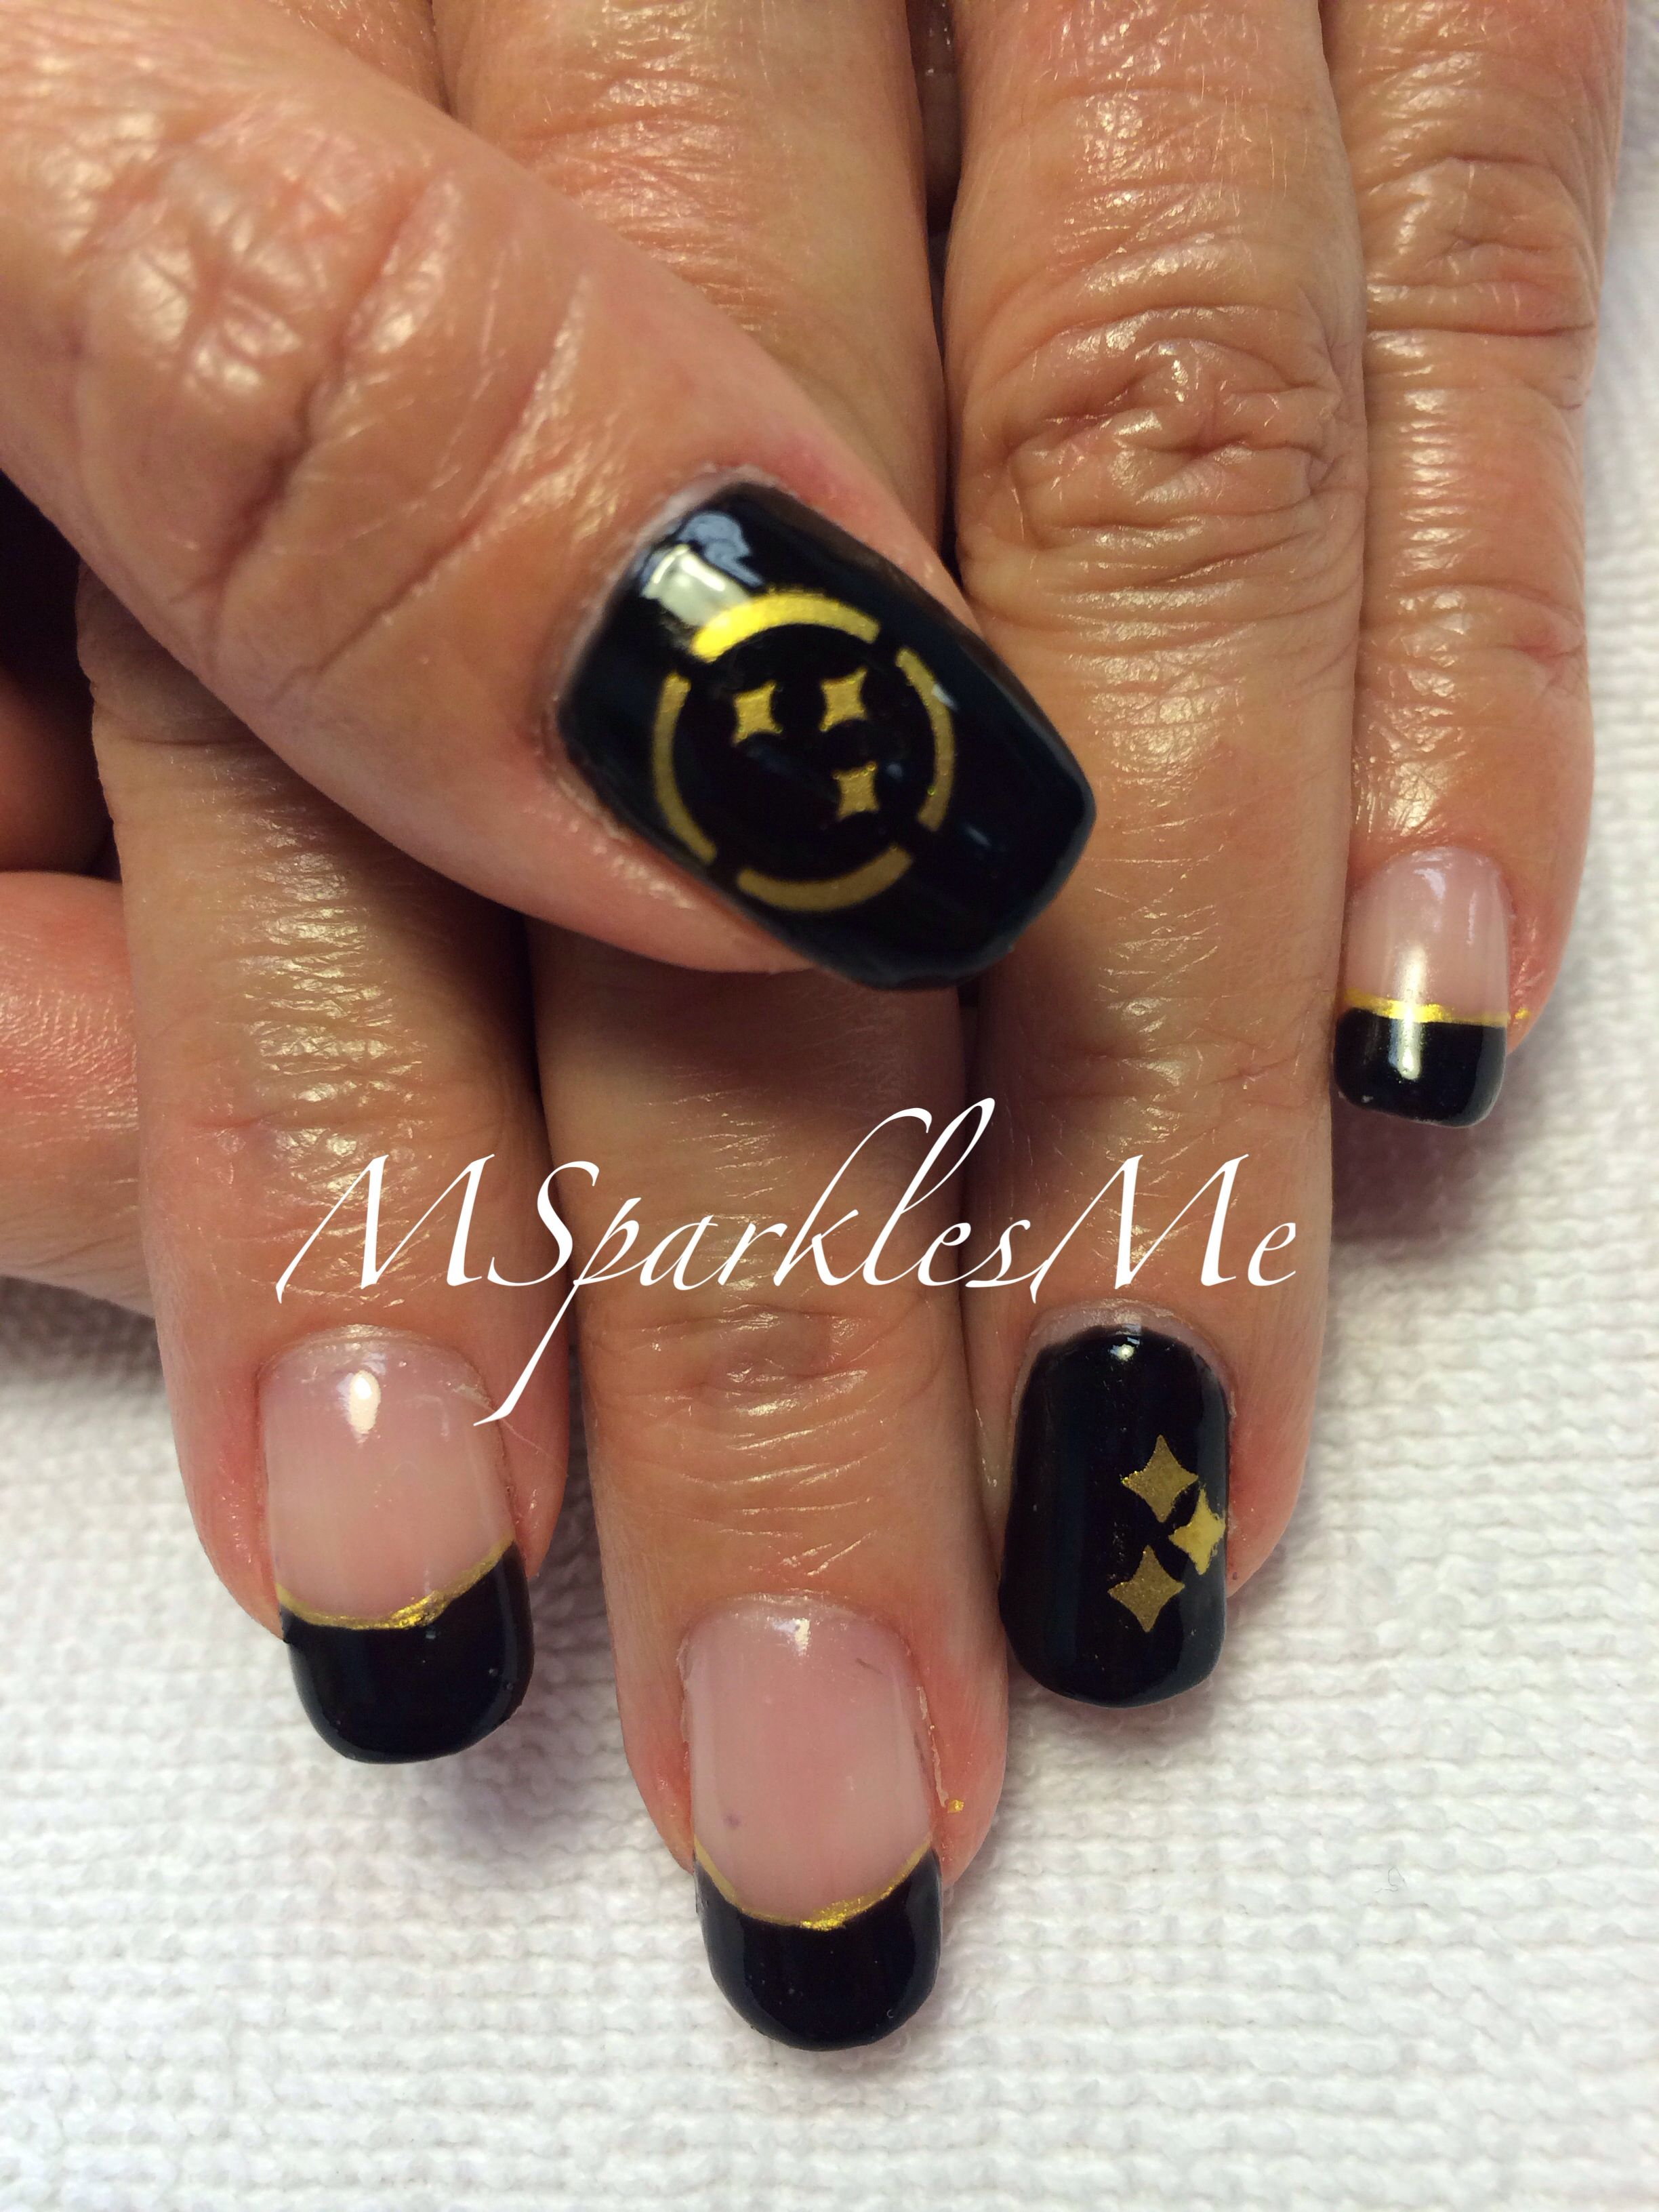 Throw Back Steeler Nails Done With Shellac Toe Nail Polish